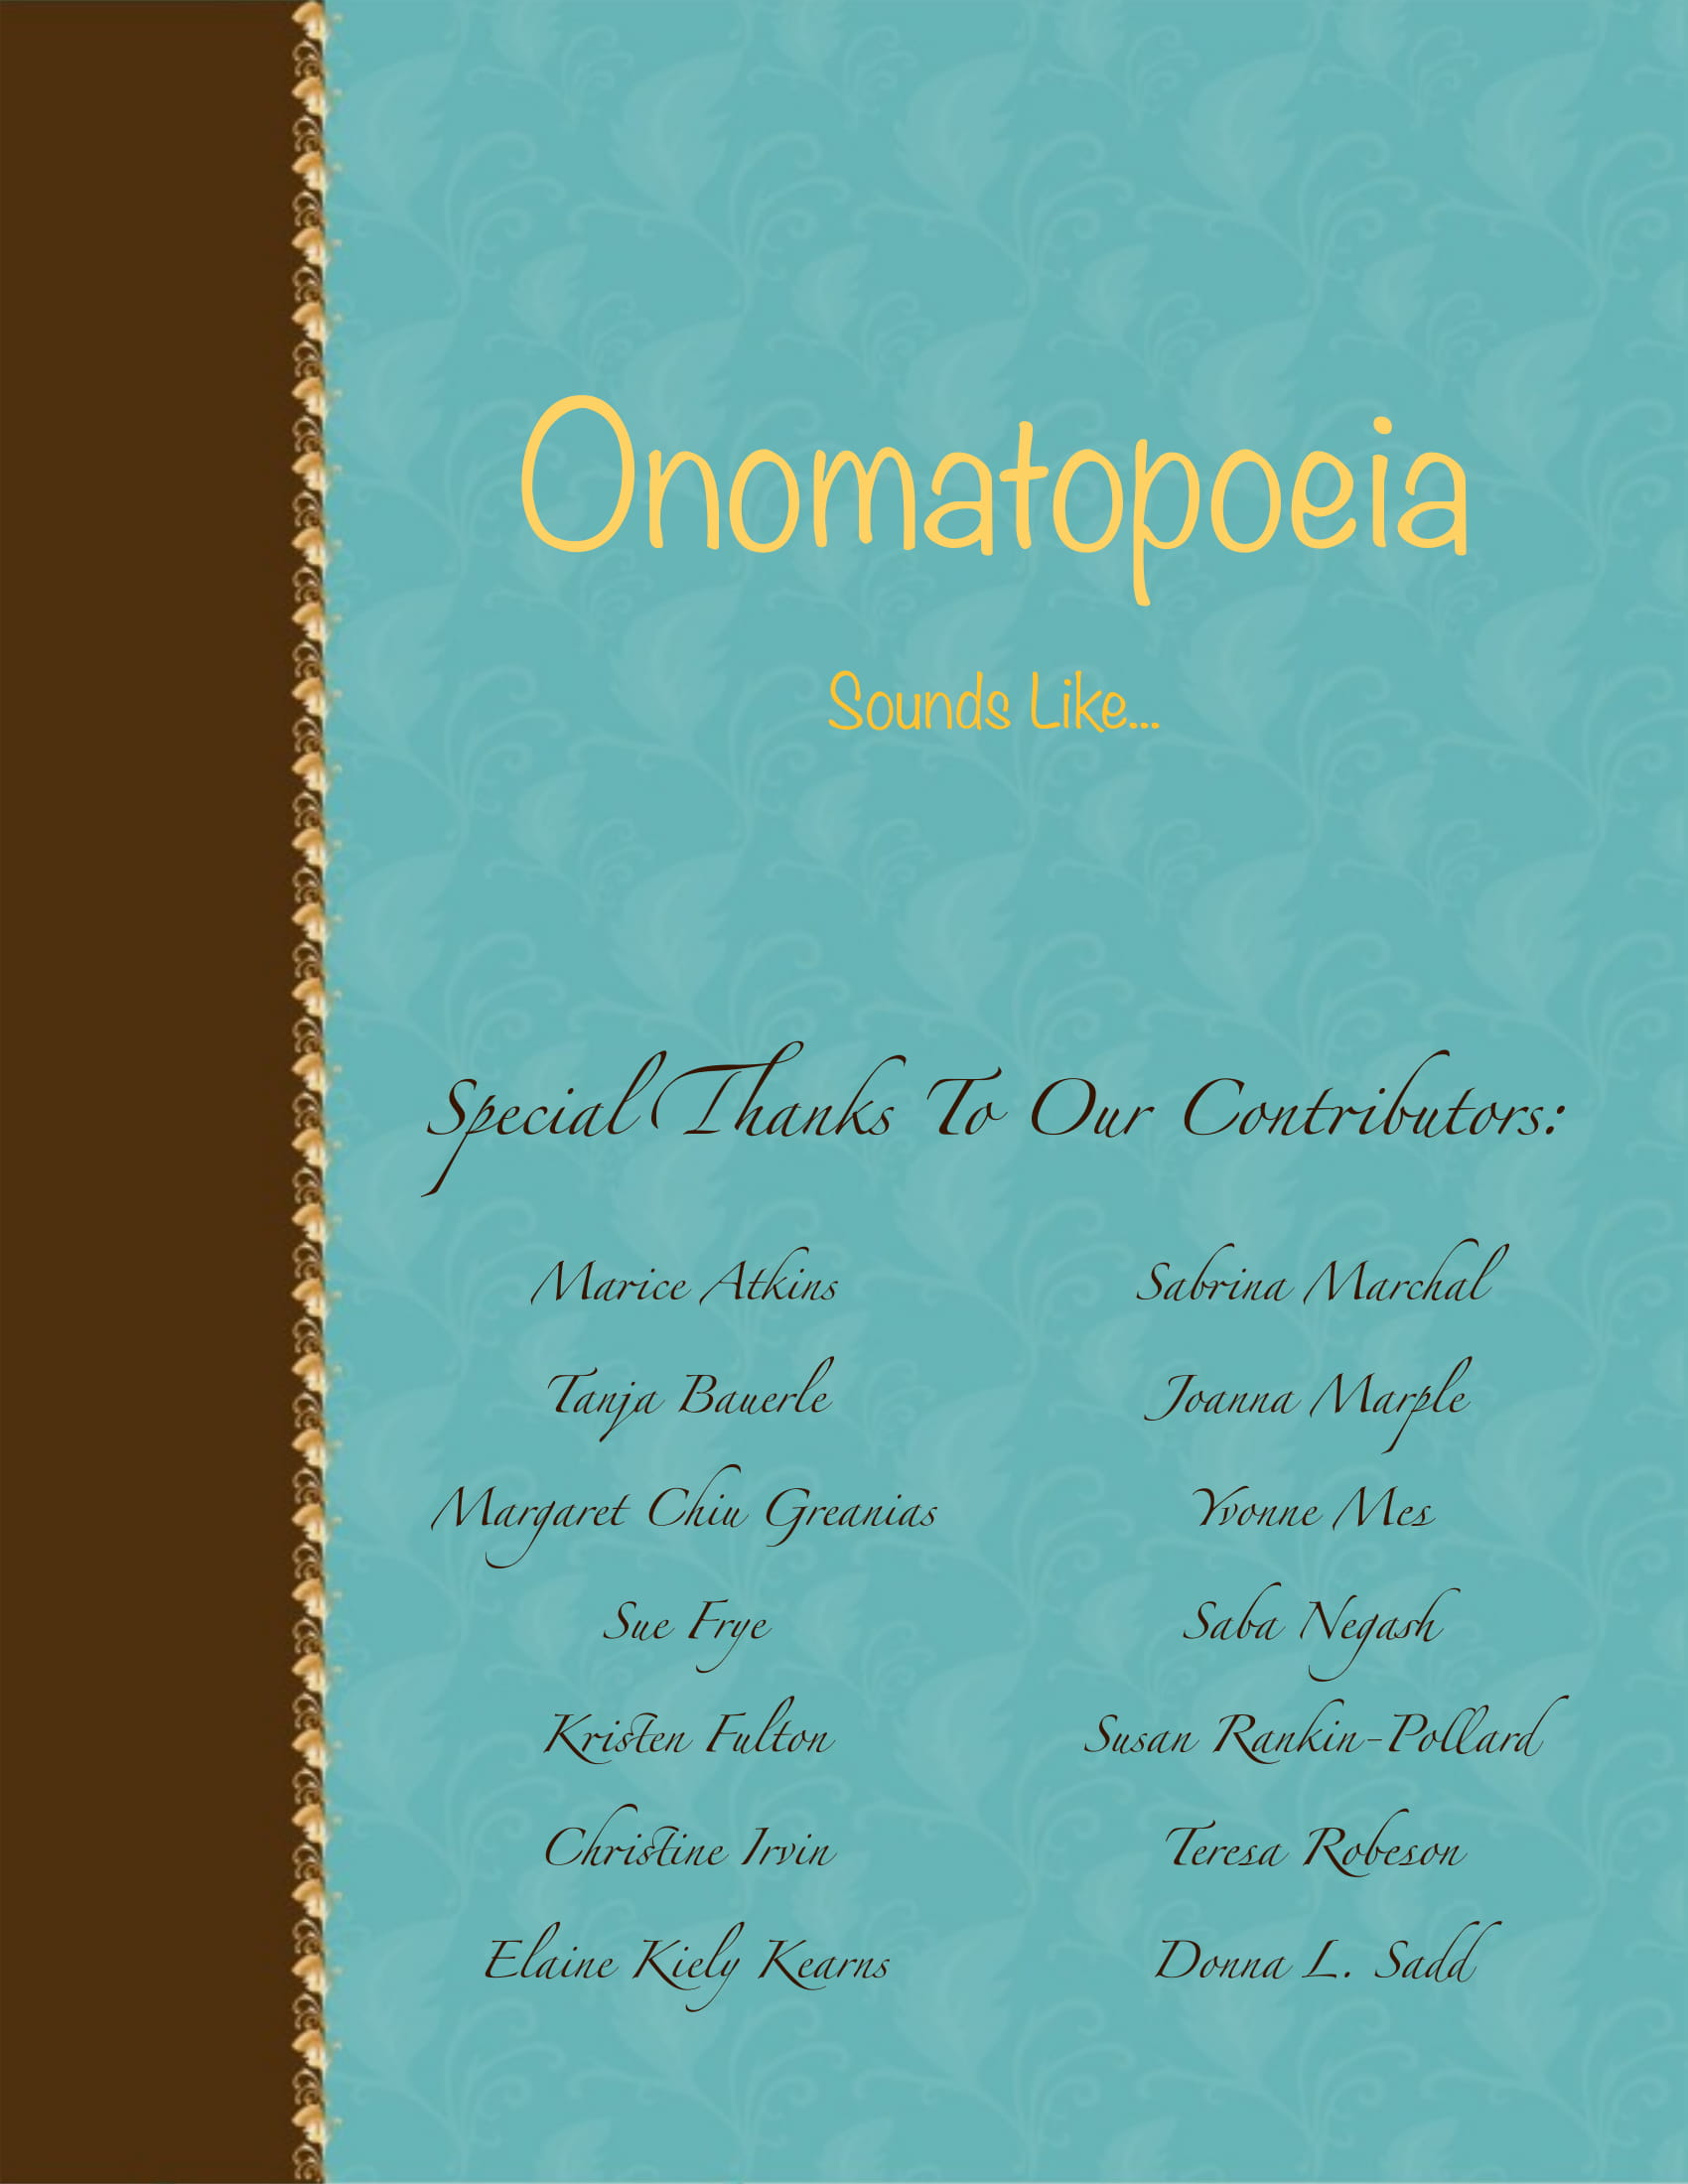 9+ Onomatopoeia Examples in Literature - PDF | Examples